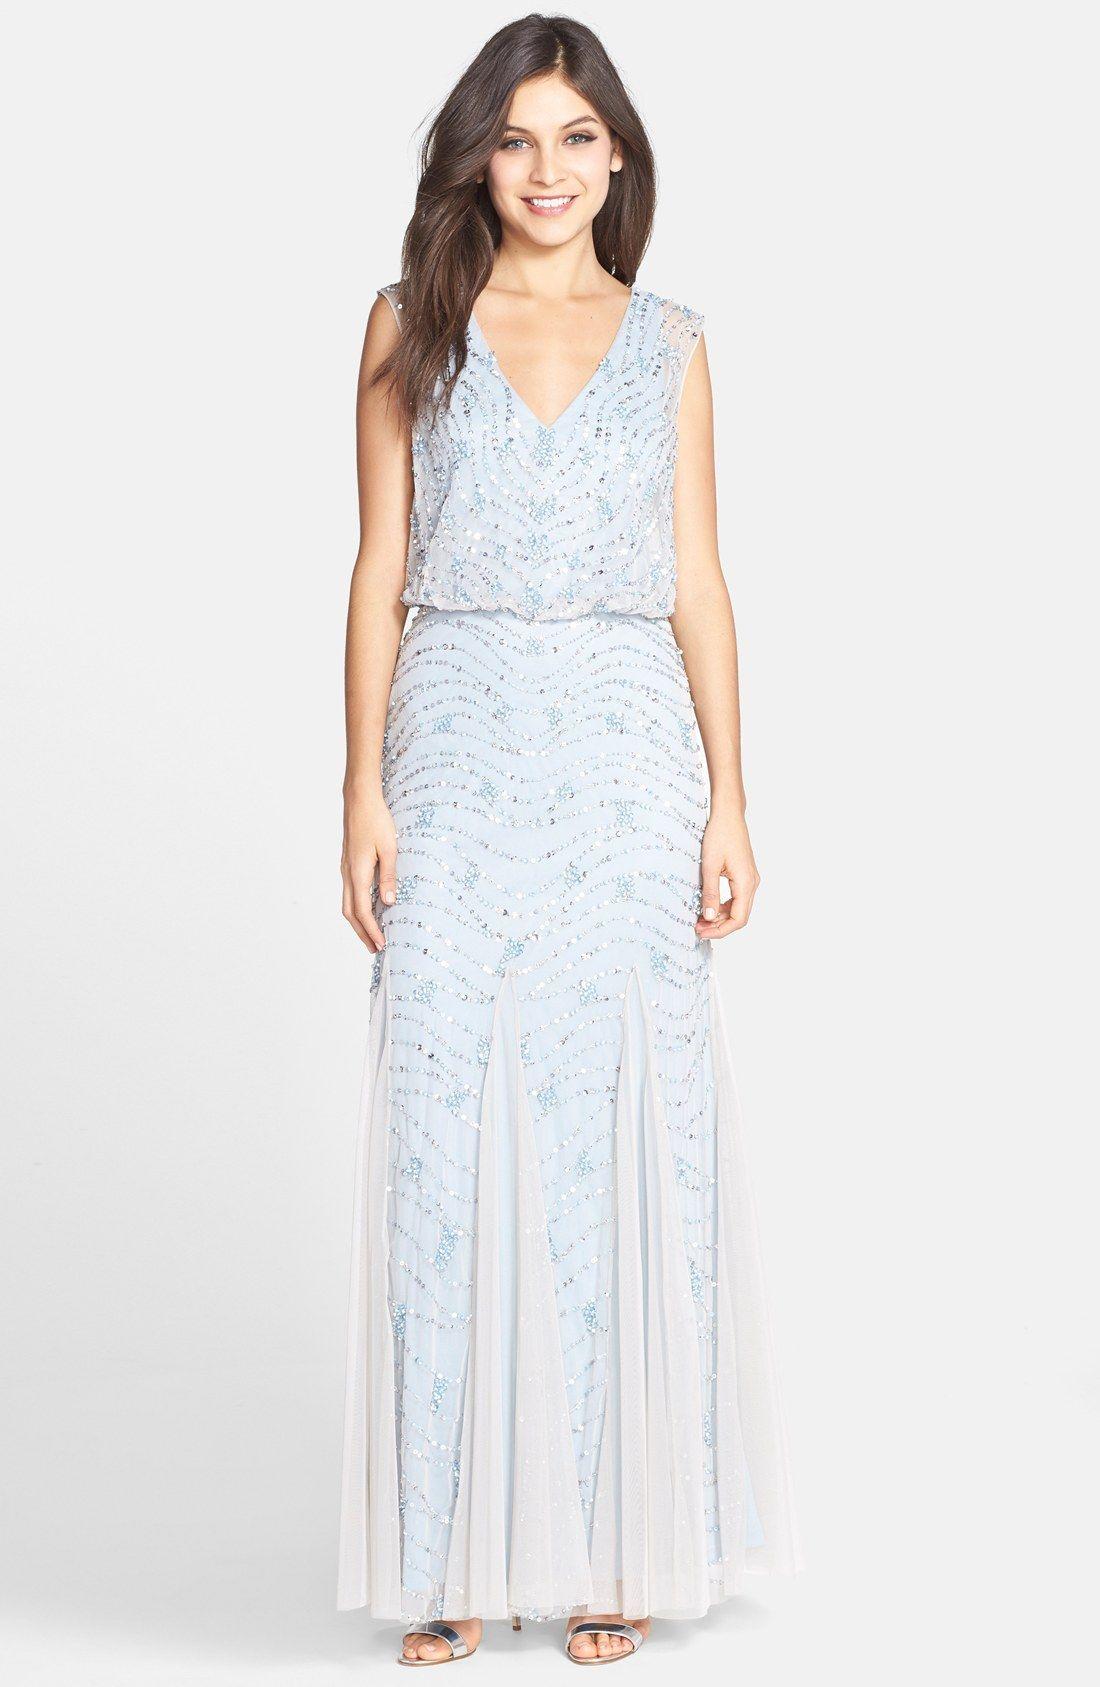 Aidan Mattox Embellished Lace Blouson Gown $450   Dress to impress ...